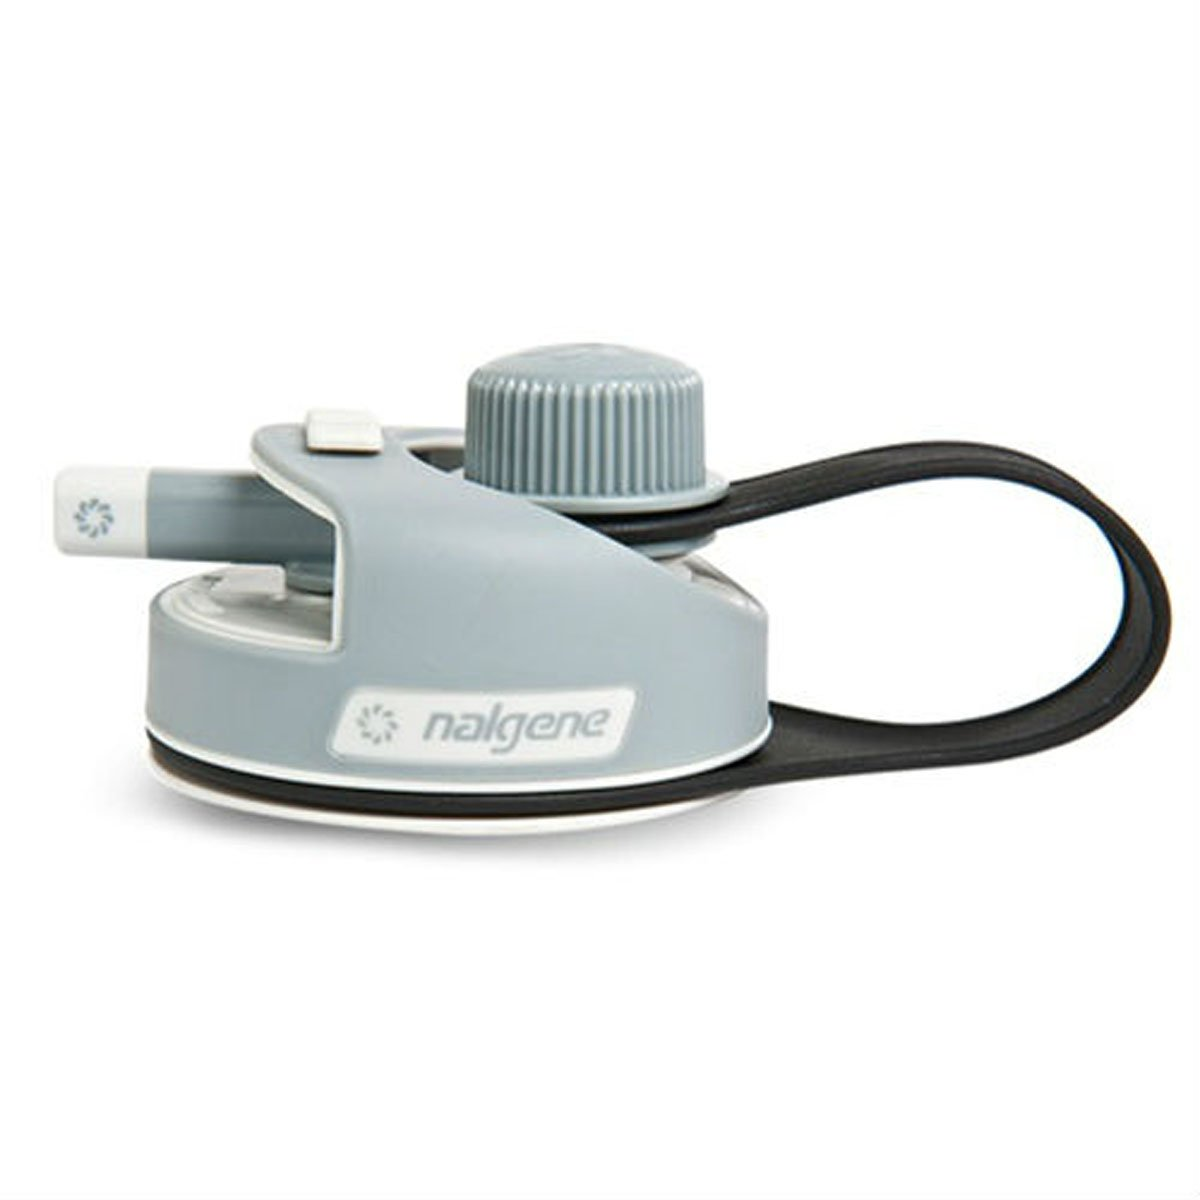 NAL-1-0461-25 Grey Nalgene Replacement MultiDrink Water Bottle Cap